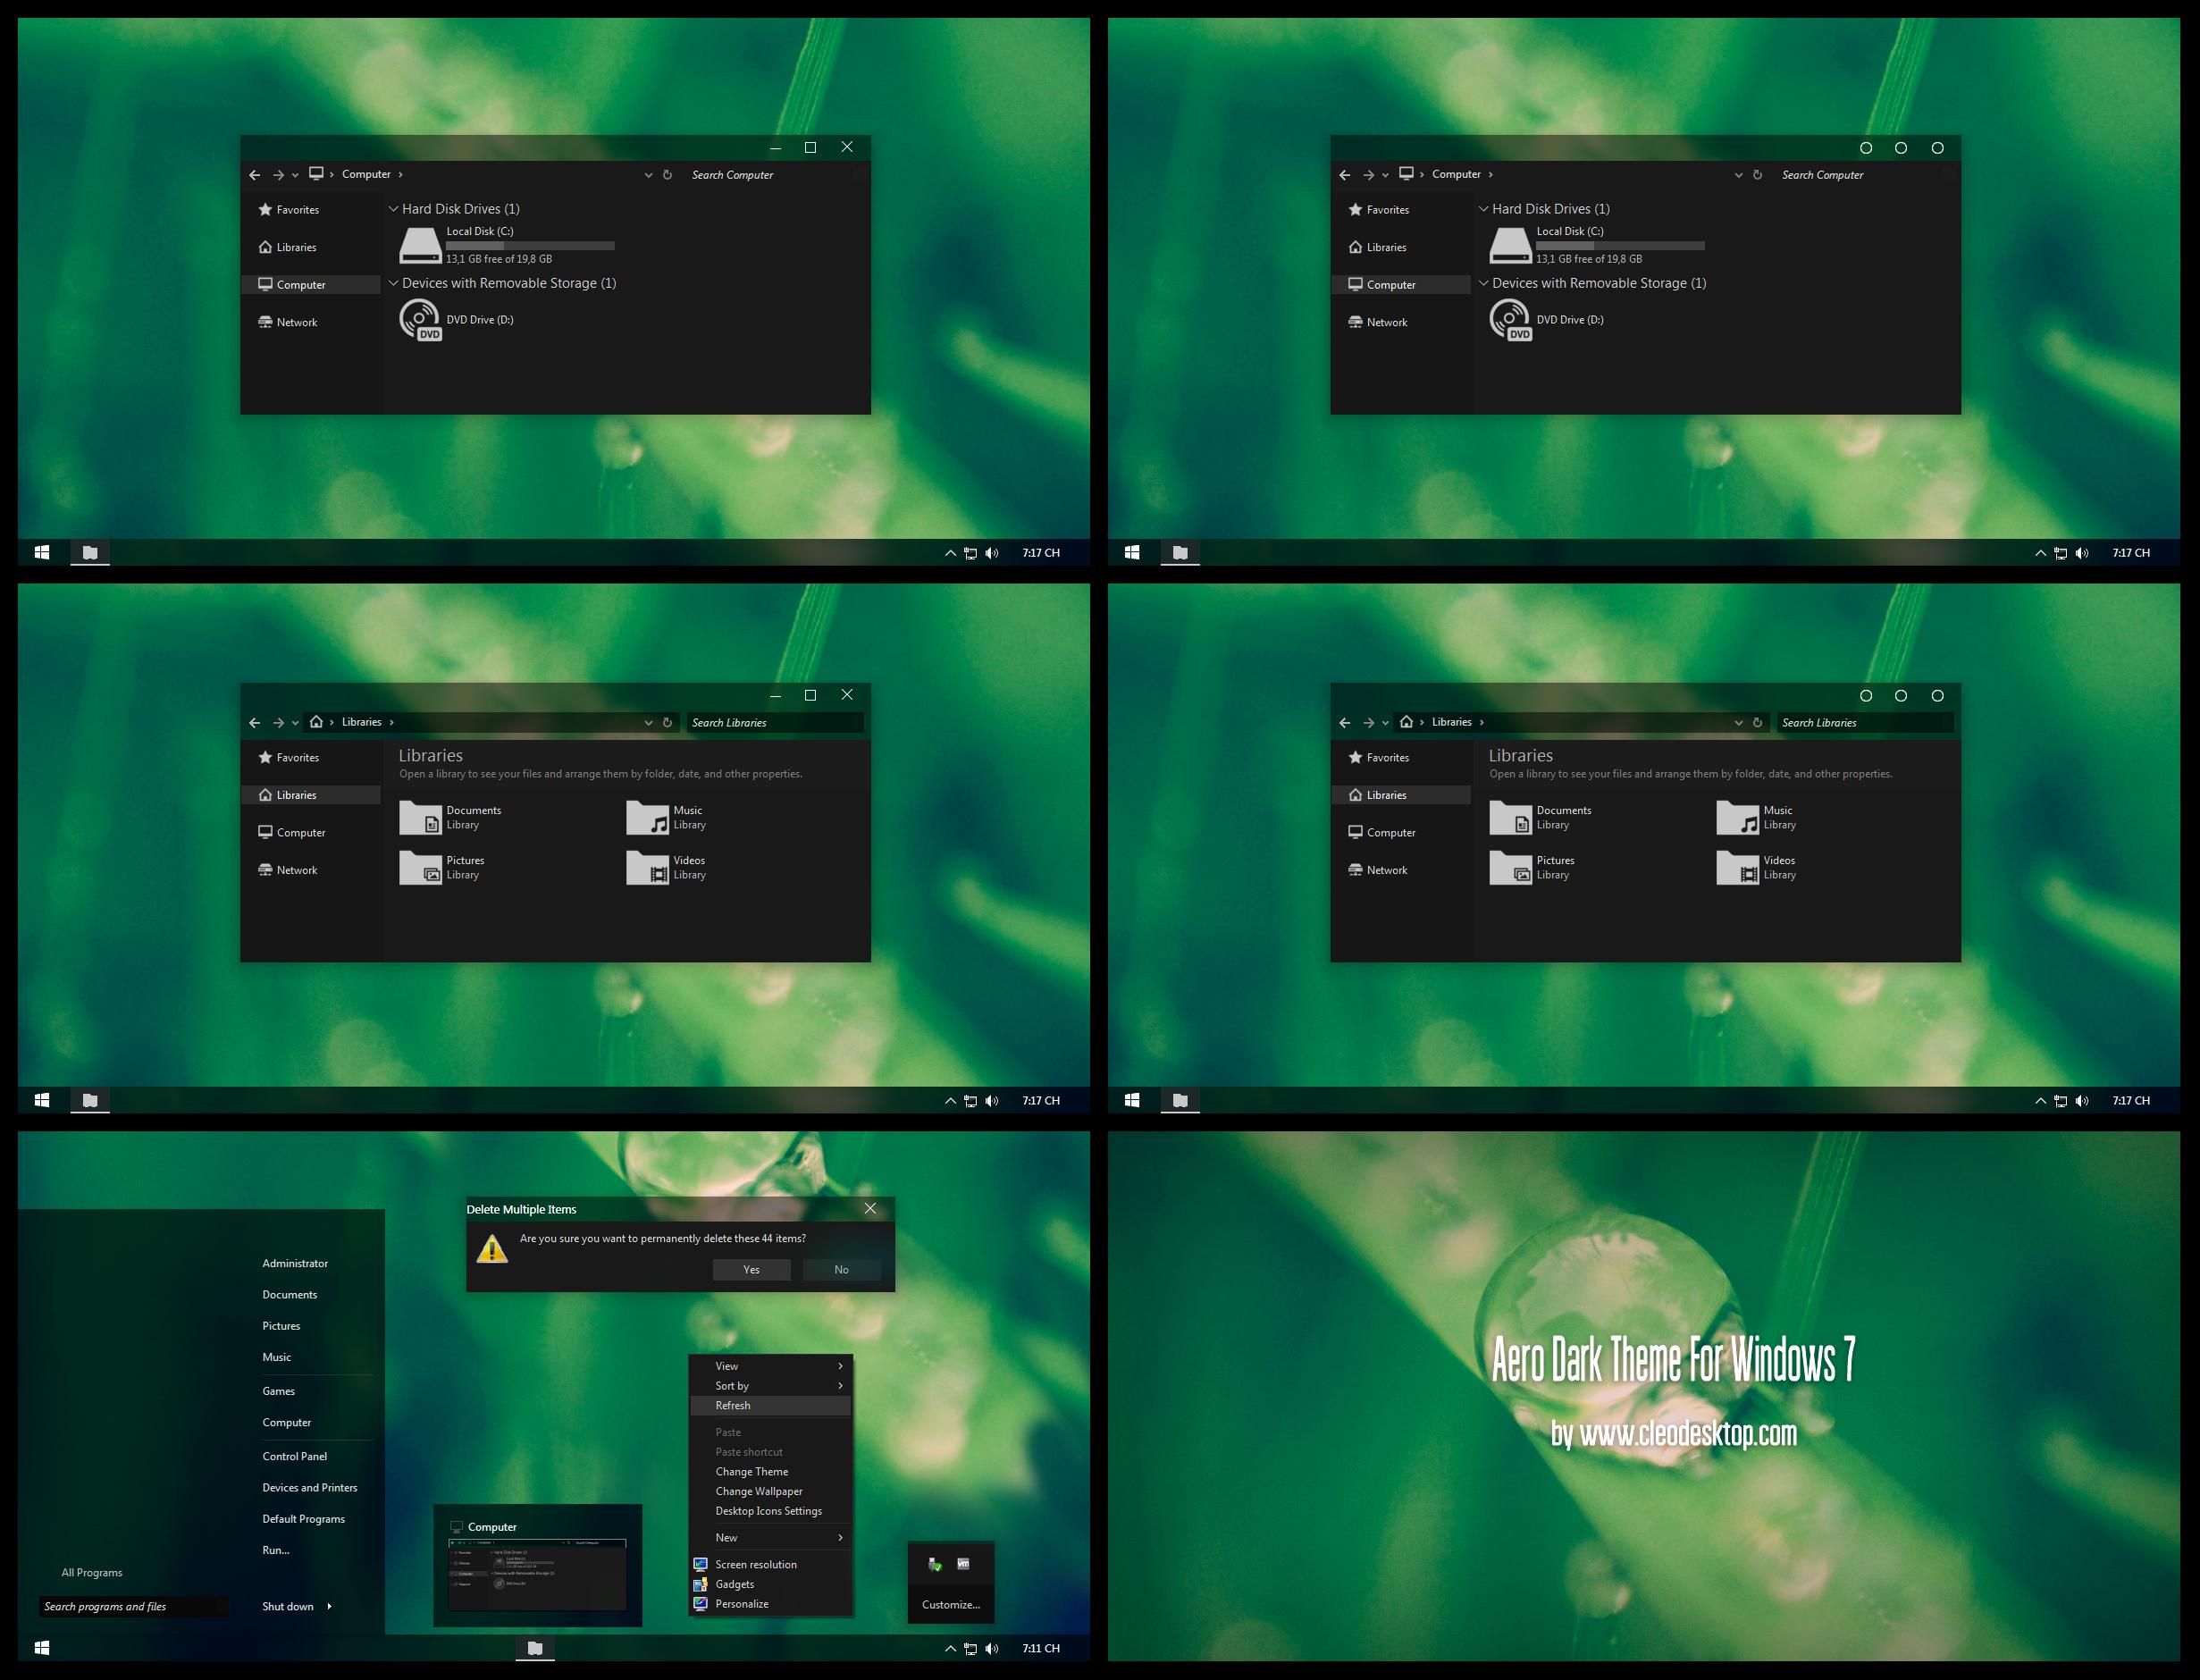 Aero Dark Theme For Windows 7 By Cleodesktop On Deviantart